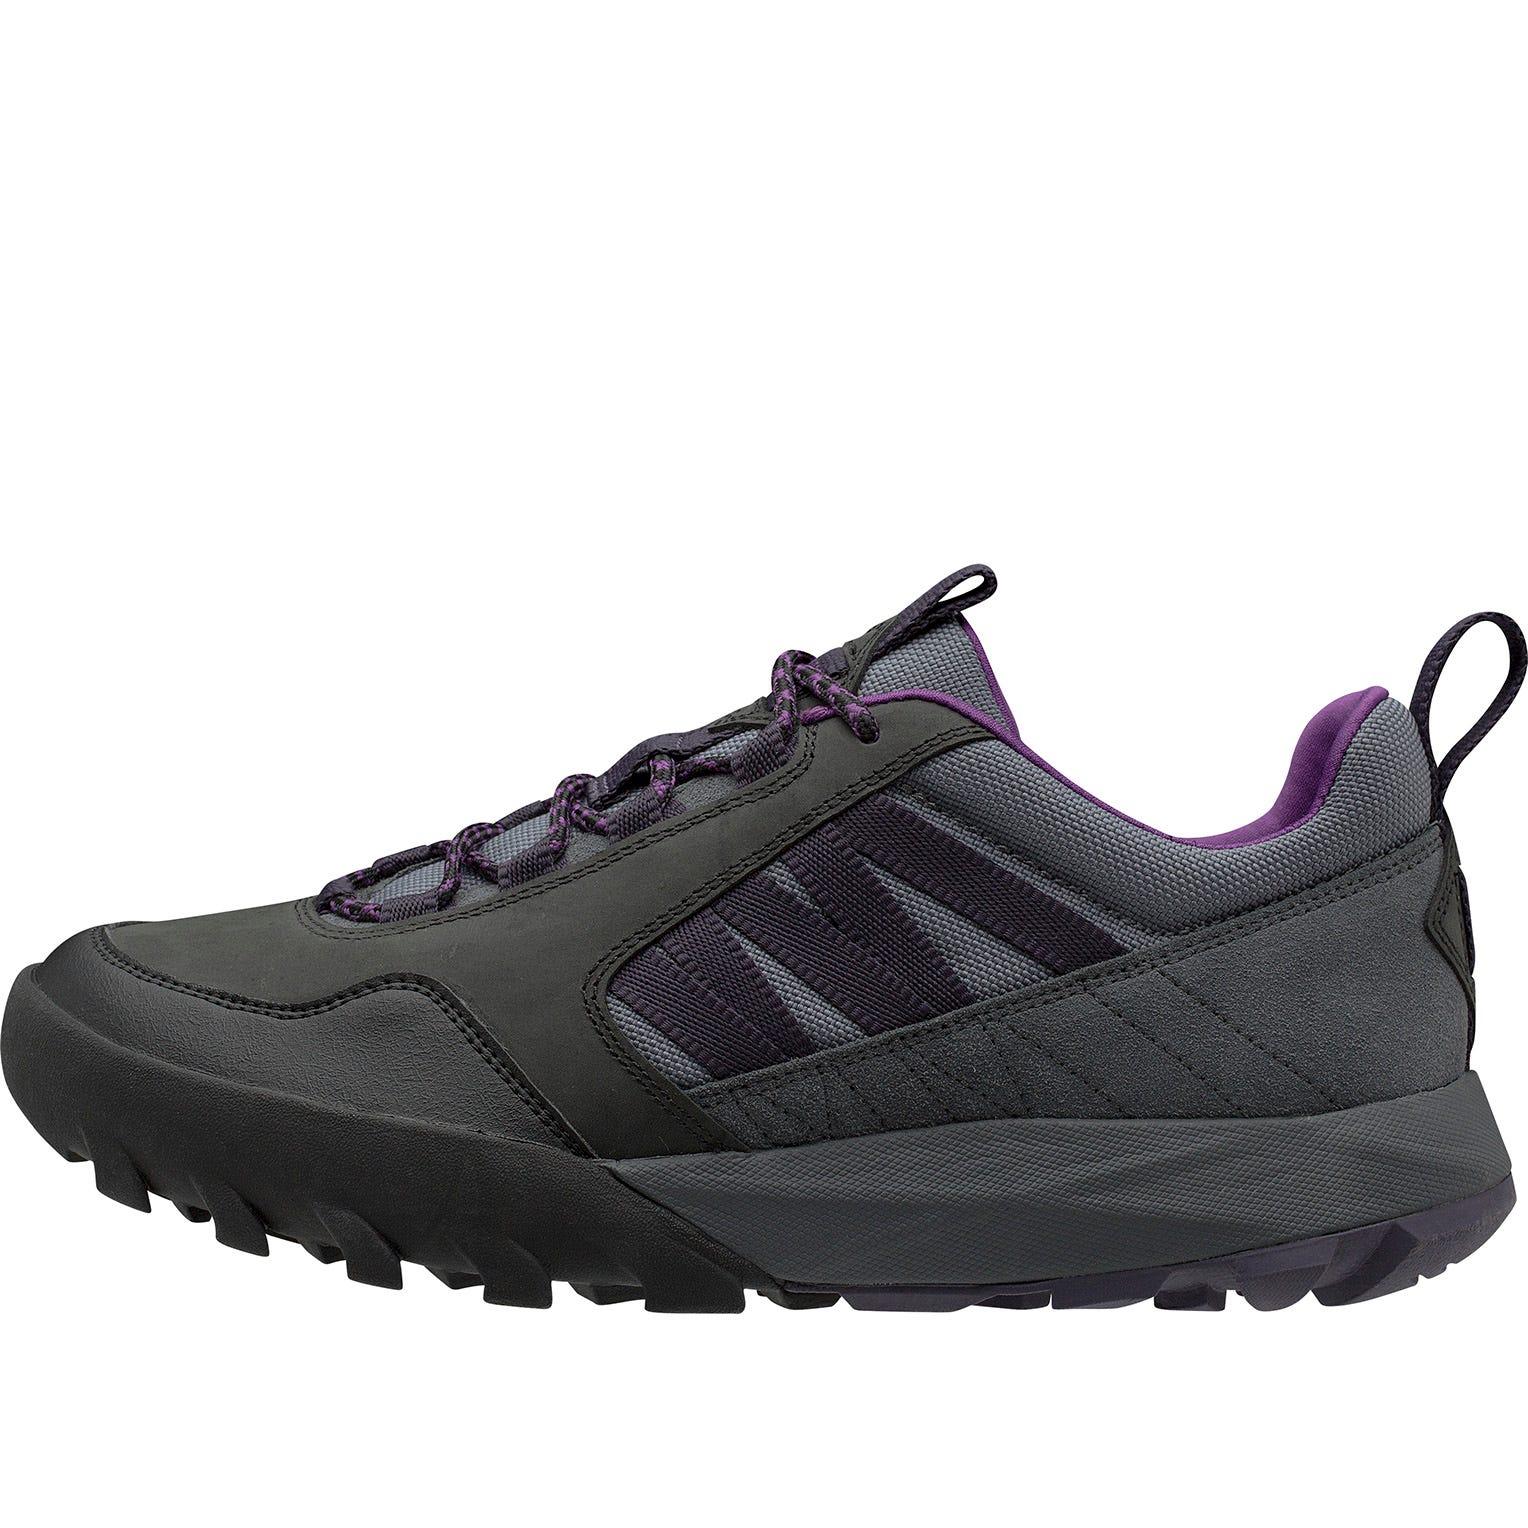 Helly Hansen Womens Loke Bowron Leather Hiking Boot Black 4.5